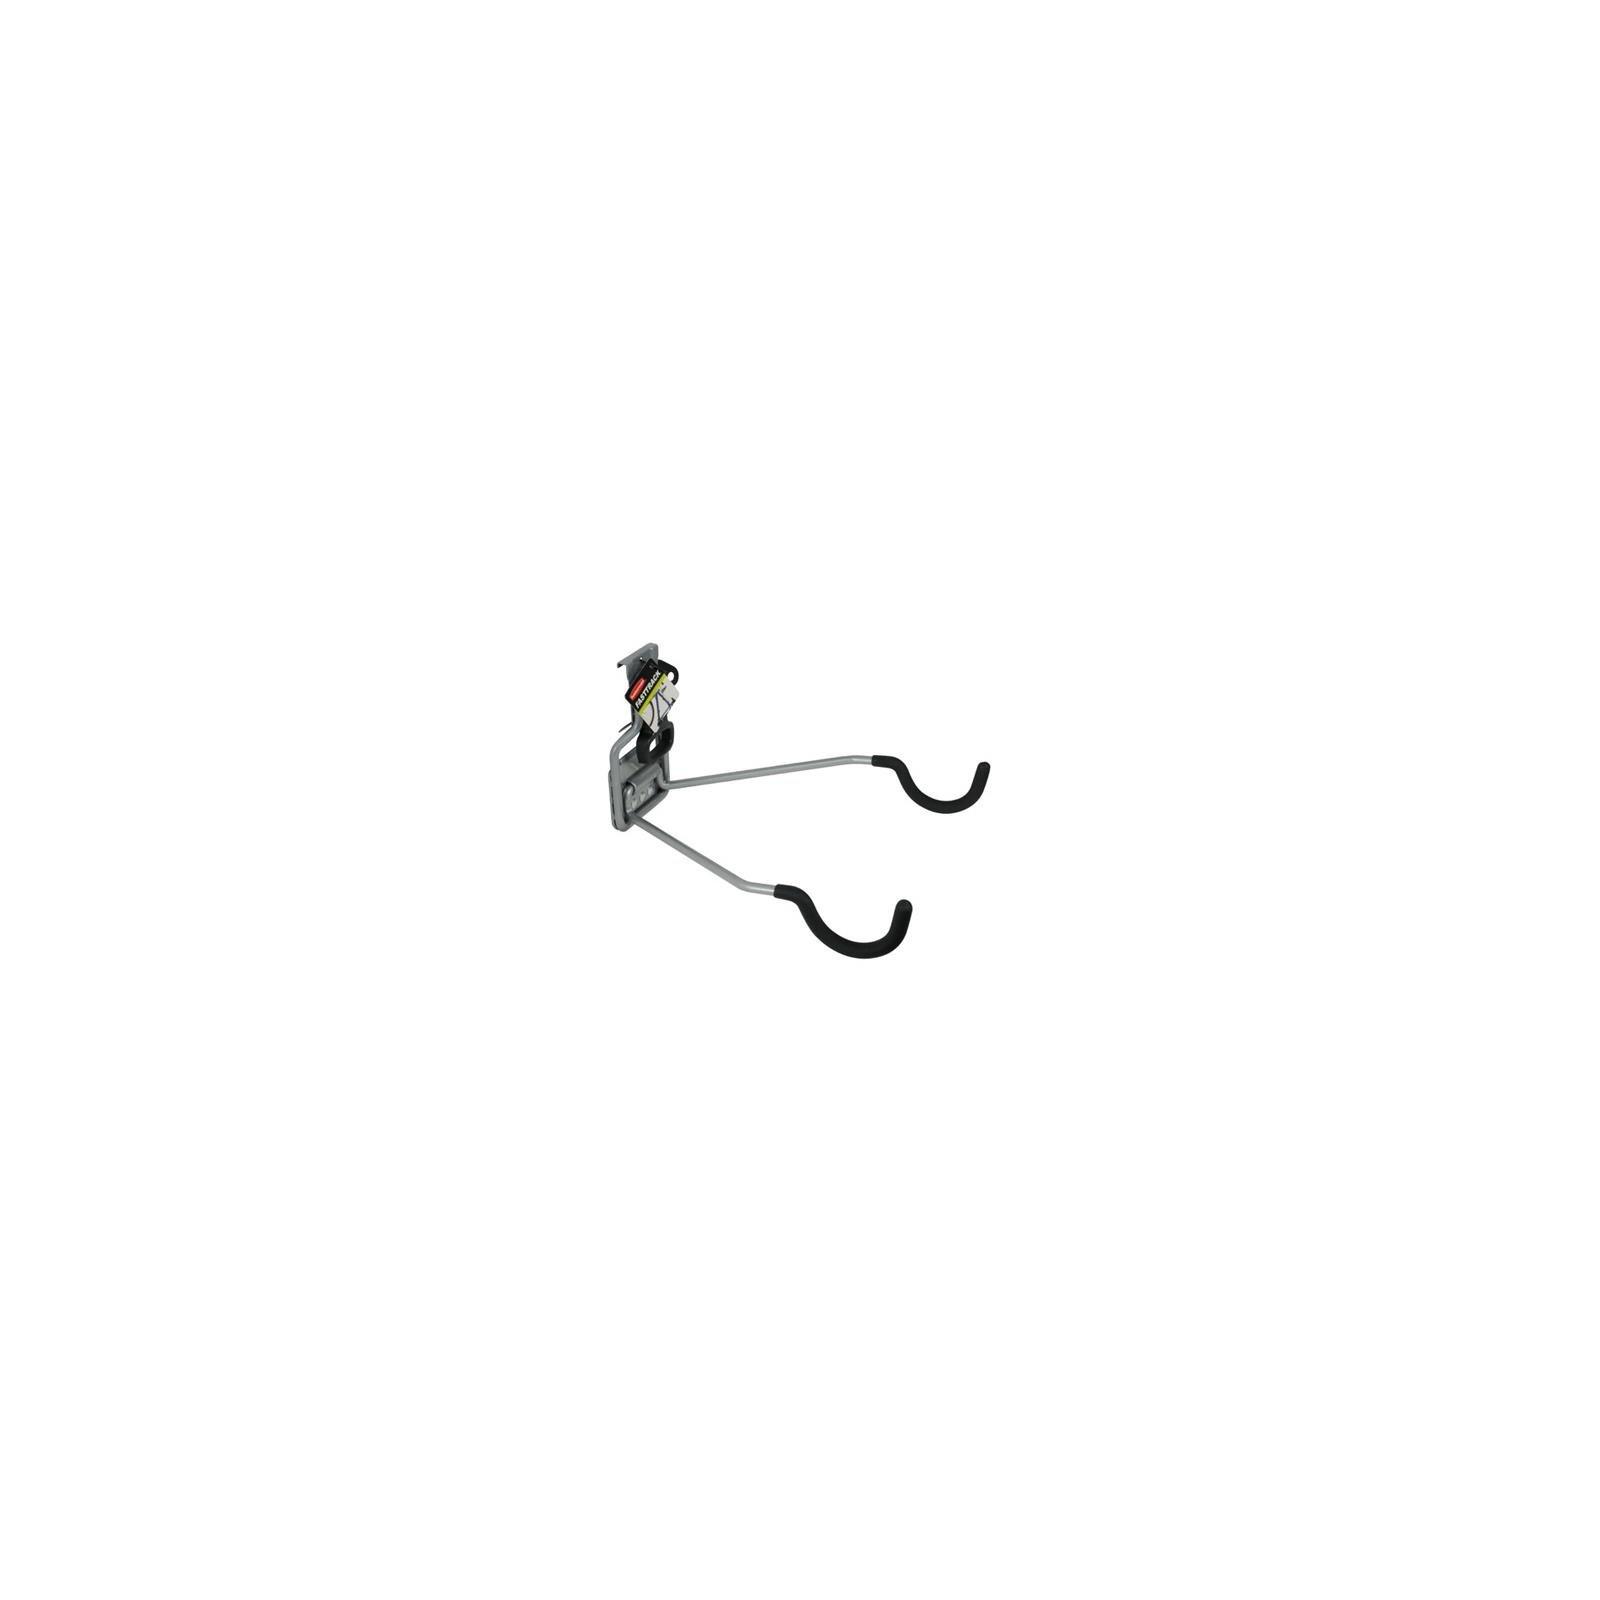 Rubbermaid 1784457 FastTrack Horizontal Bike Hook